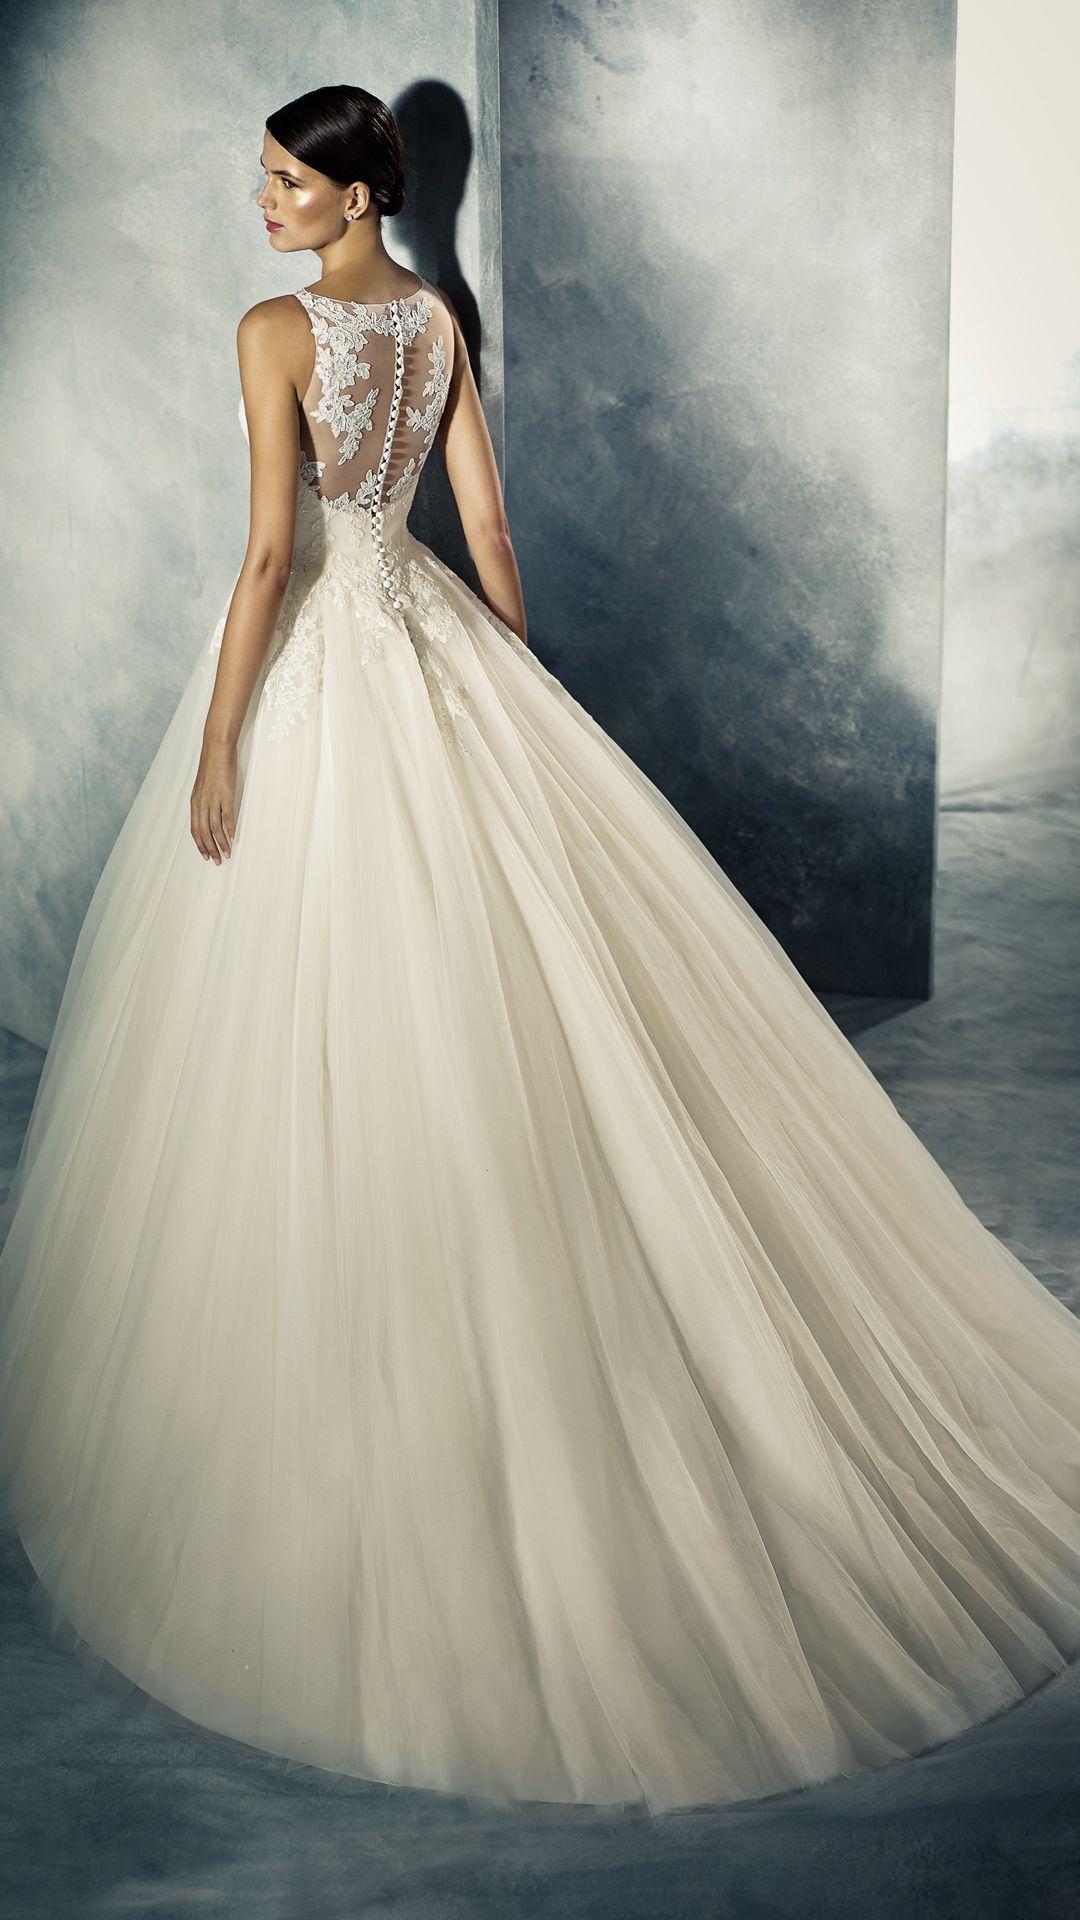 Brautkleid-White-One-Kollektion-Modell-JARISSA-C  Brautkleid